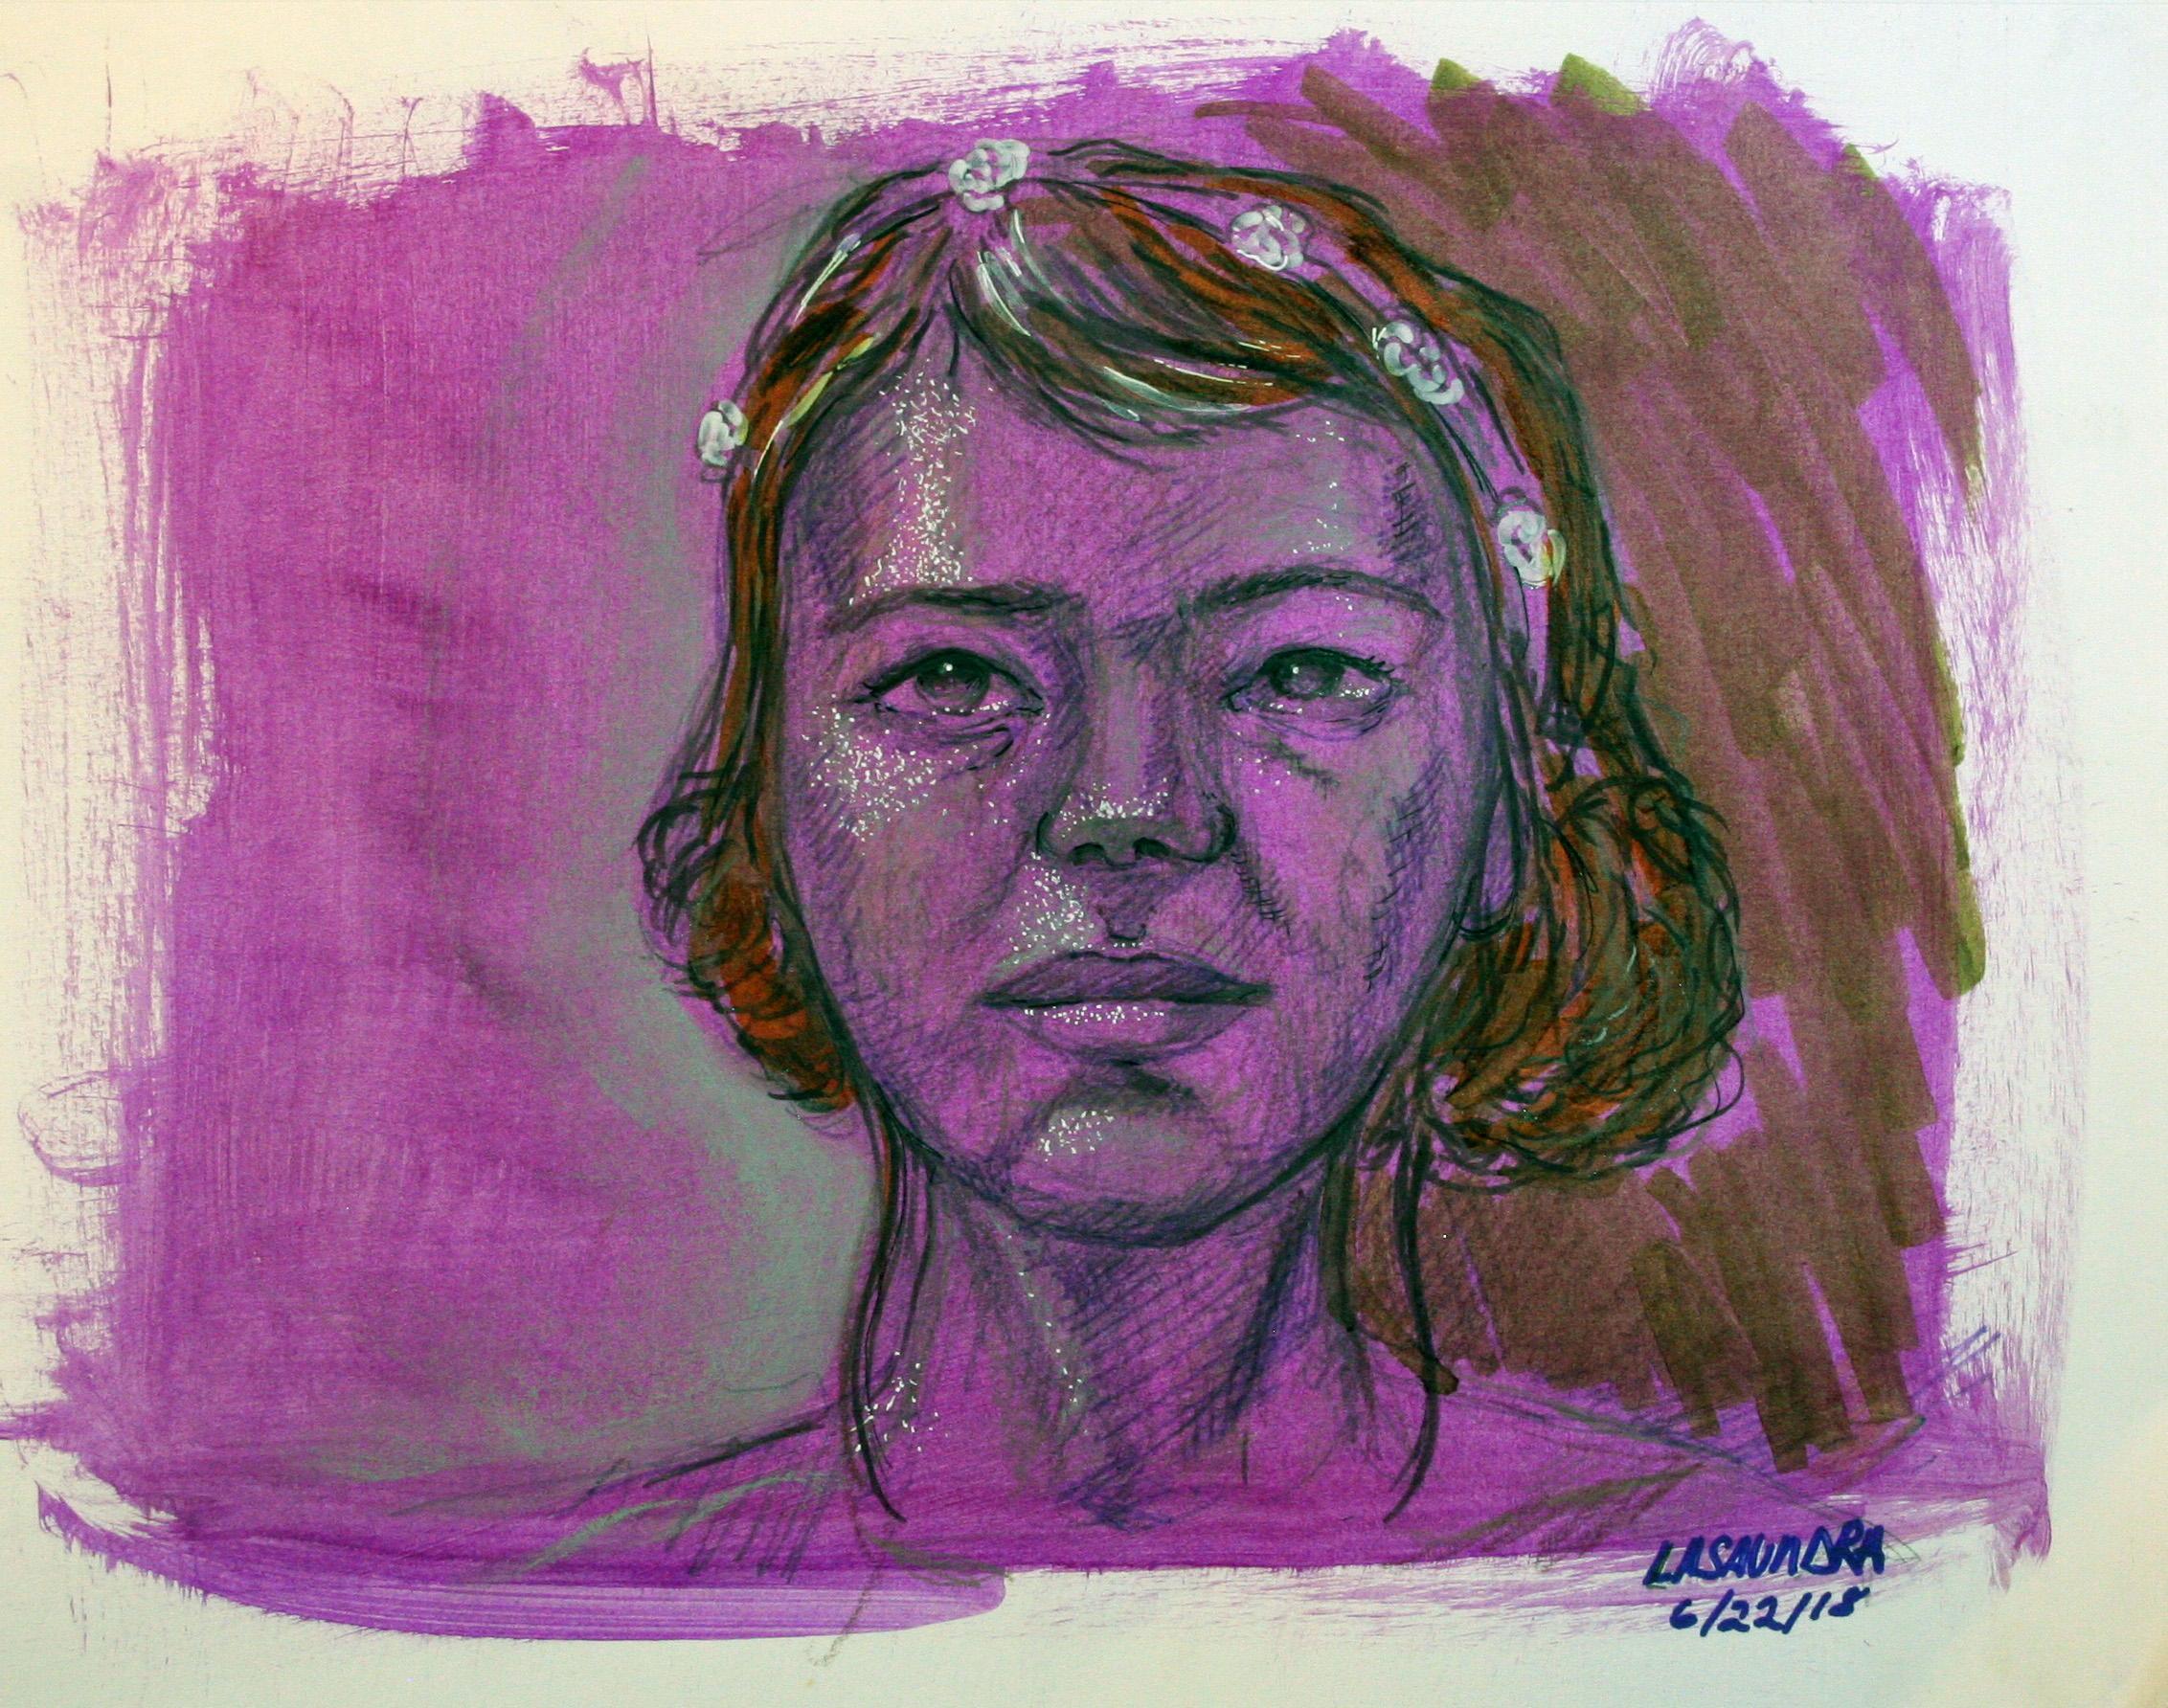 La Saundra Robinson did this drawing.